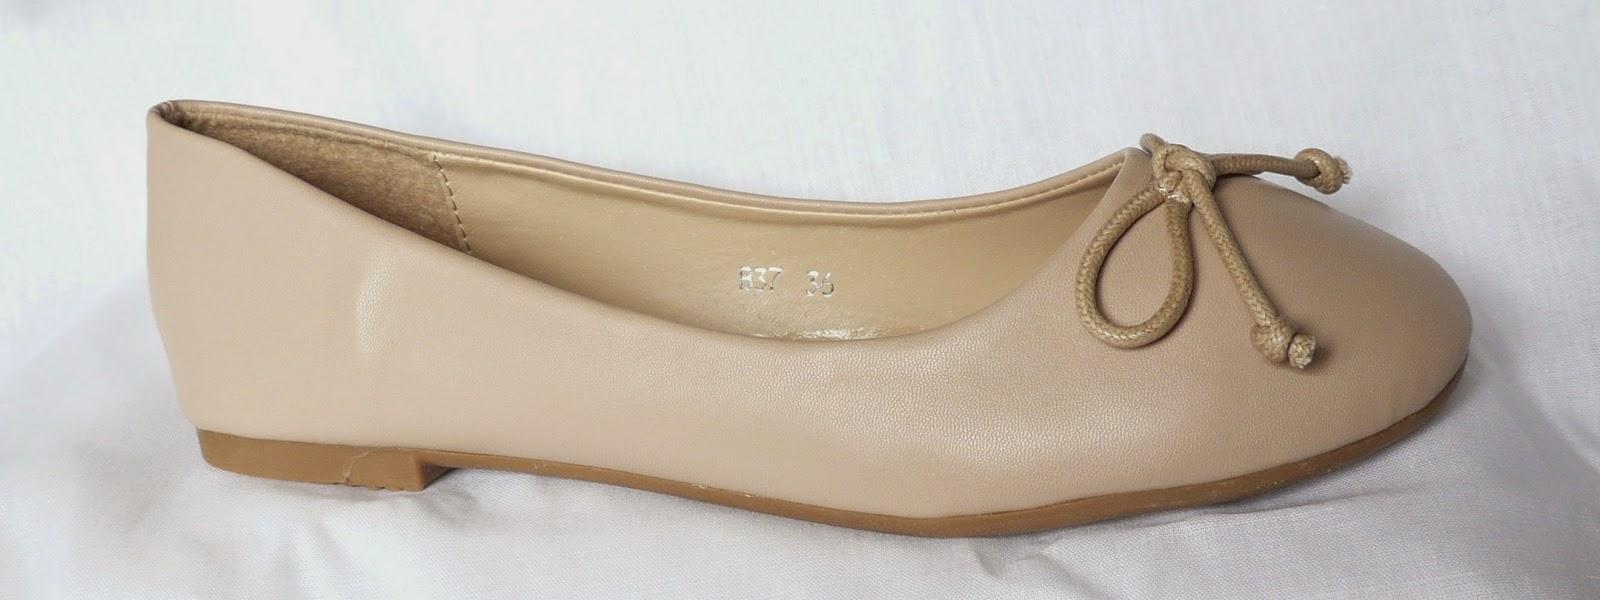 http://www.ebay.fr/itm/ballerines-beiges-noeud-ballerine-interieur-cuir-petit-prix-beige-superbes-/300896529325?ssPageName=STRK:MESE:IT